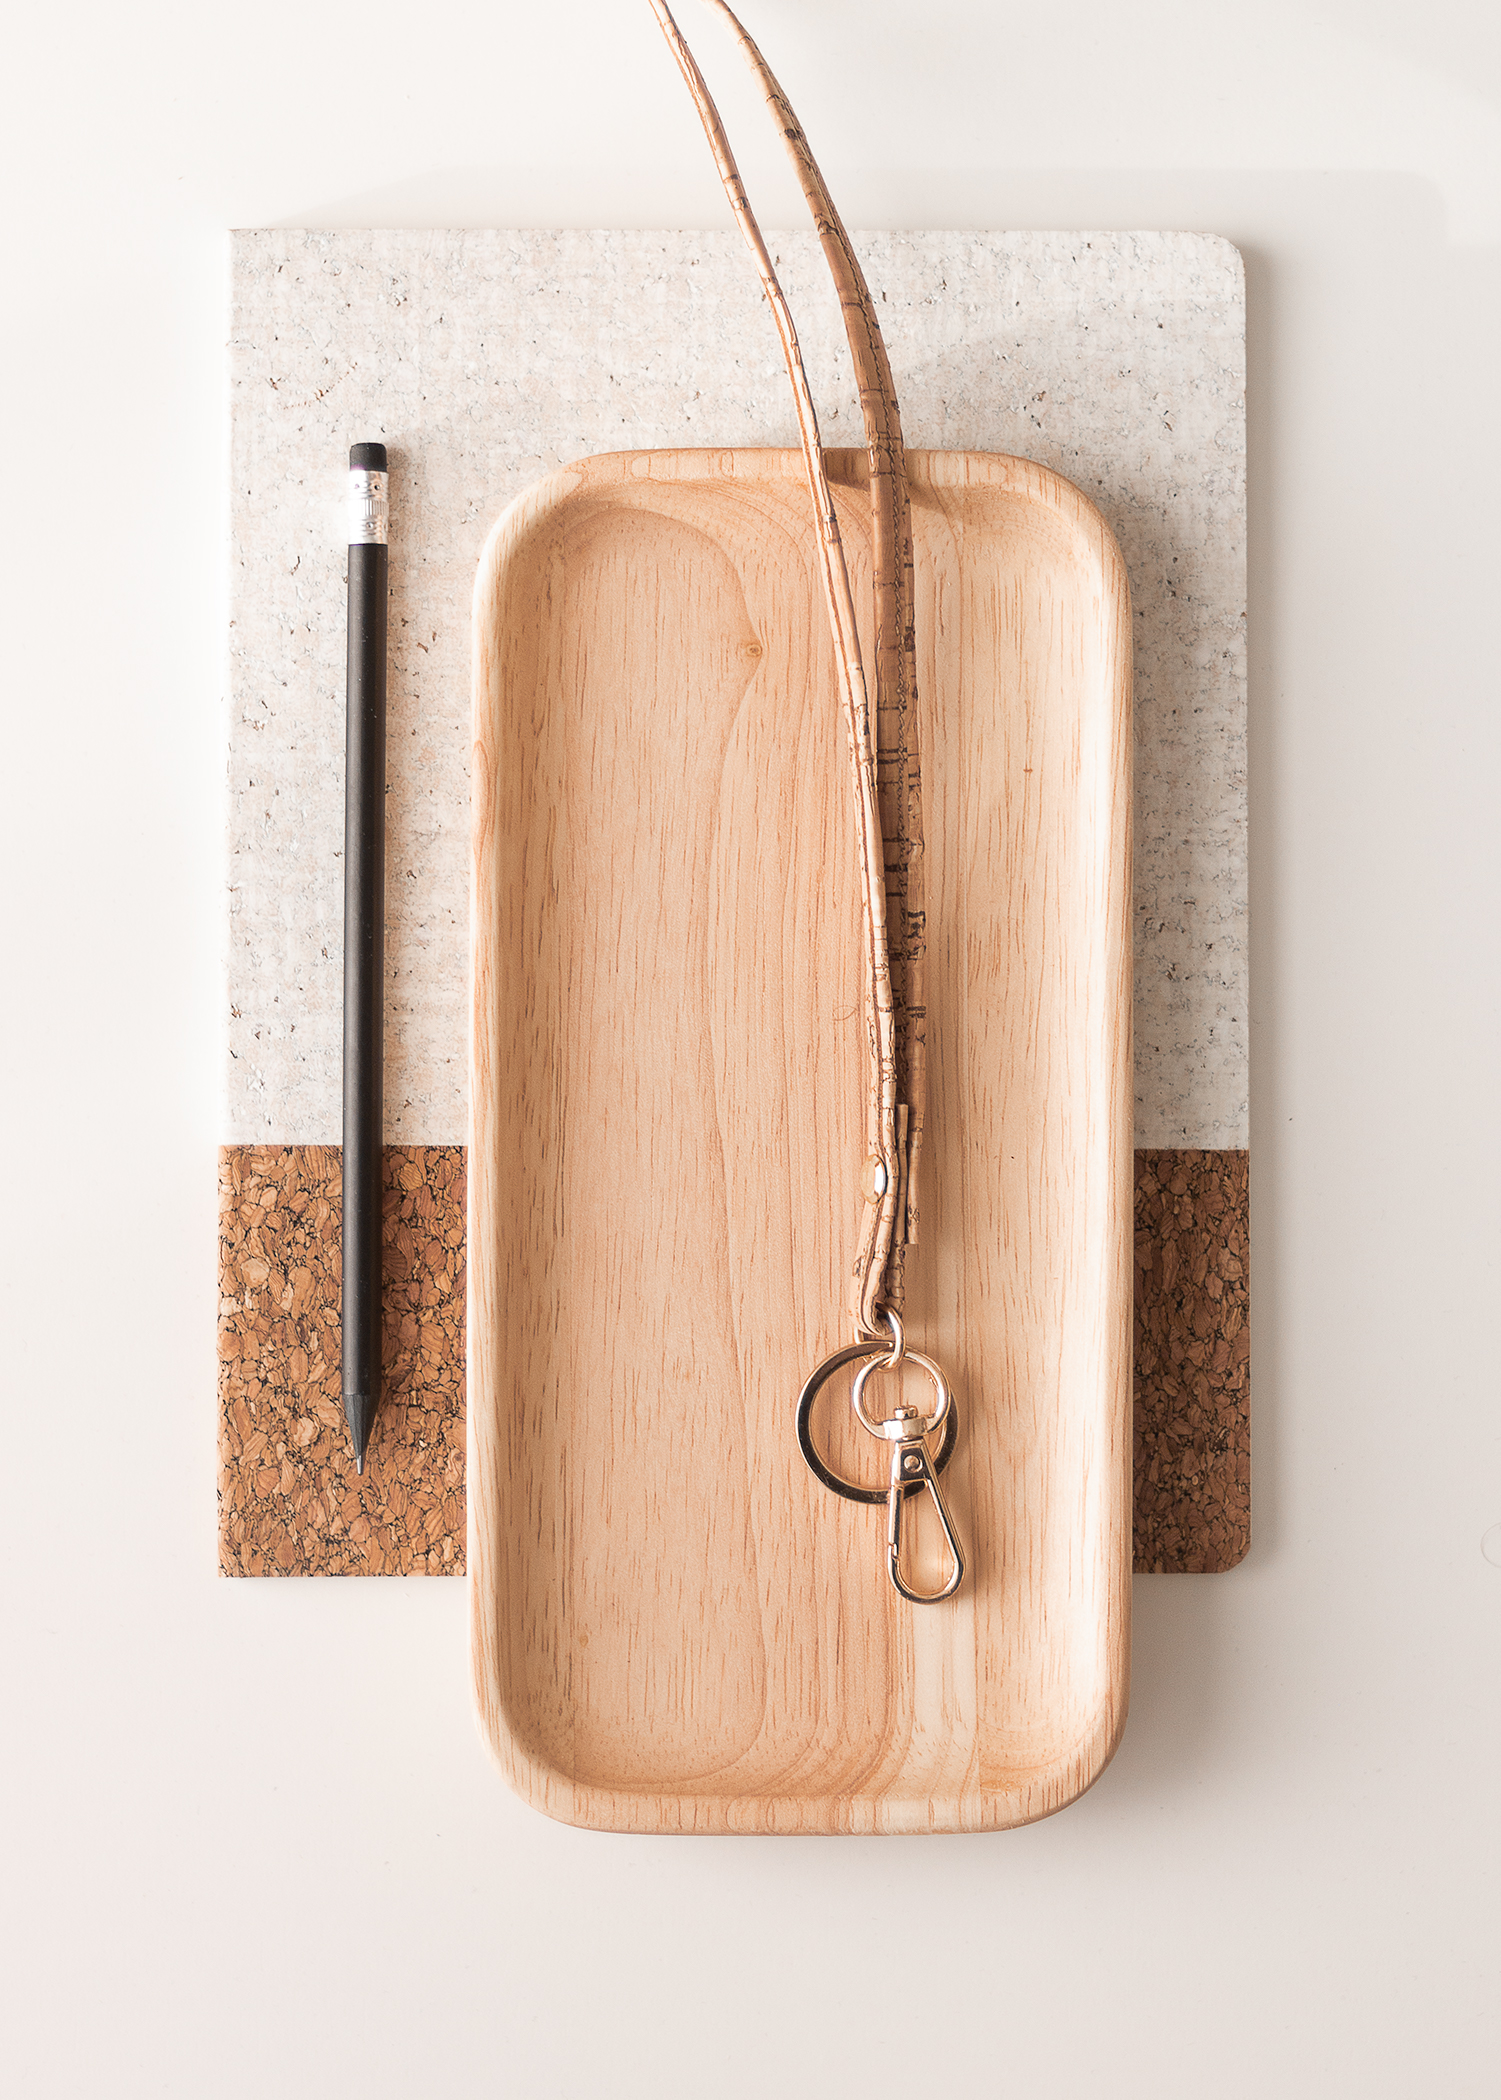 DIY Nyckelband i korktyg   Back-to-school   Back-to-work   Key chain   Gör det själv   By Sandramaria